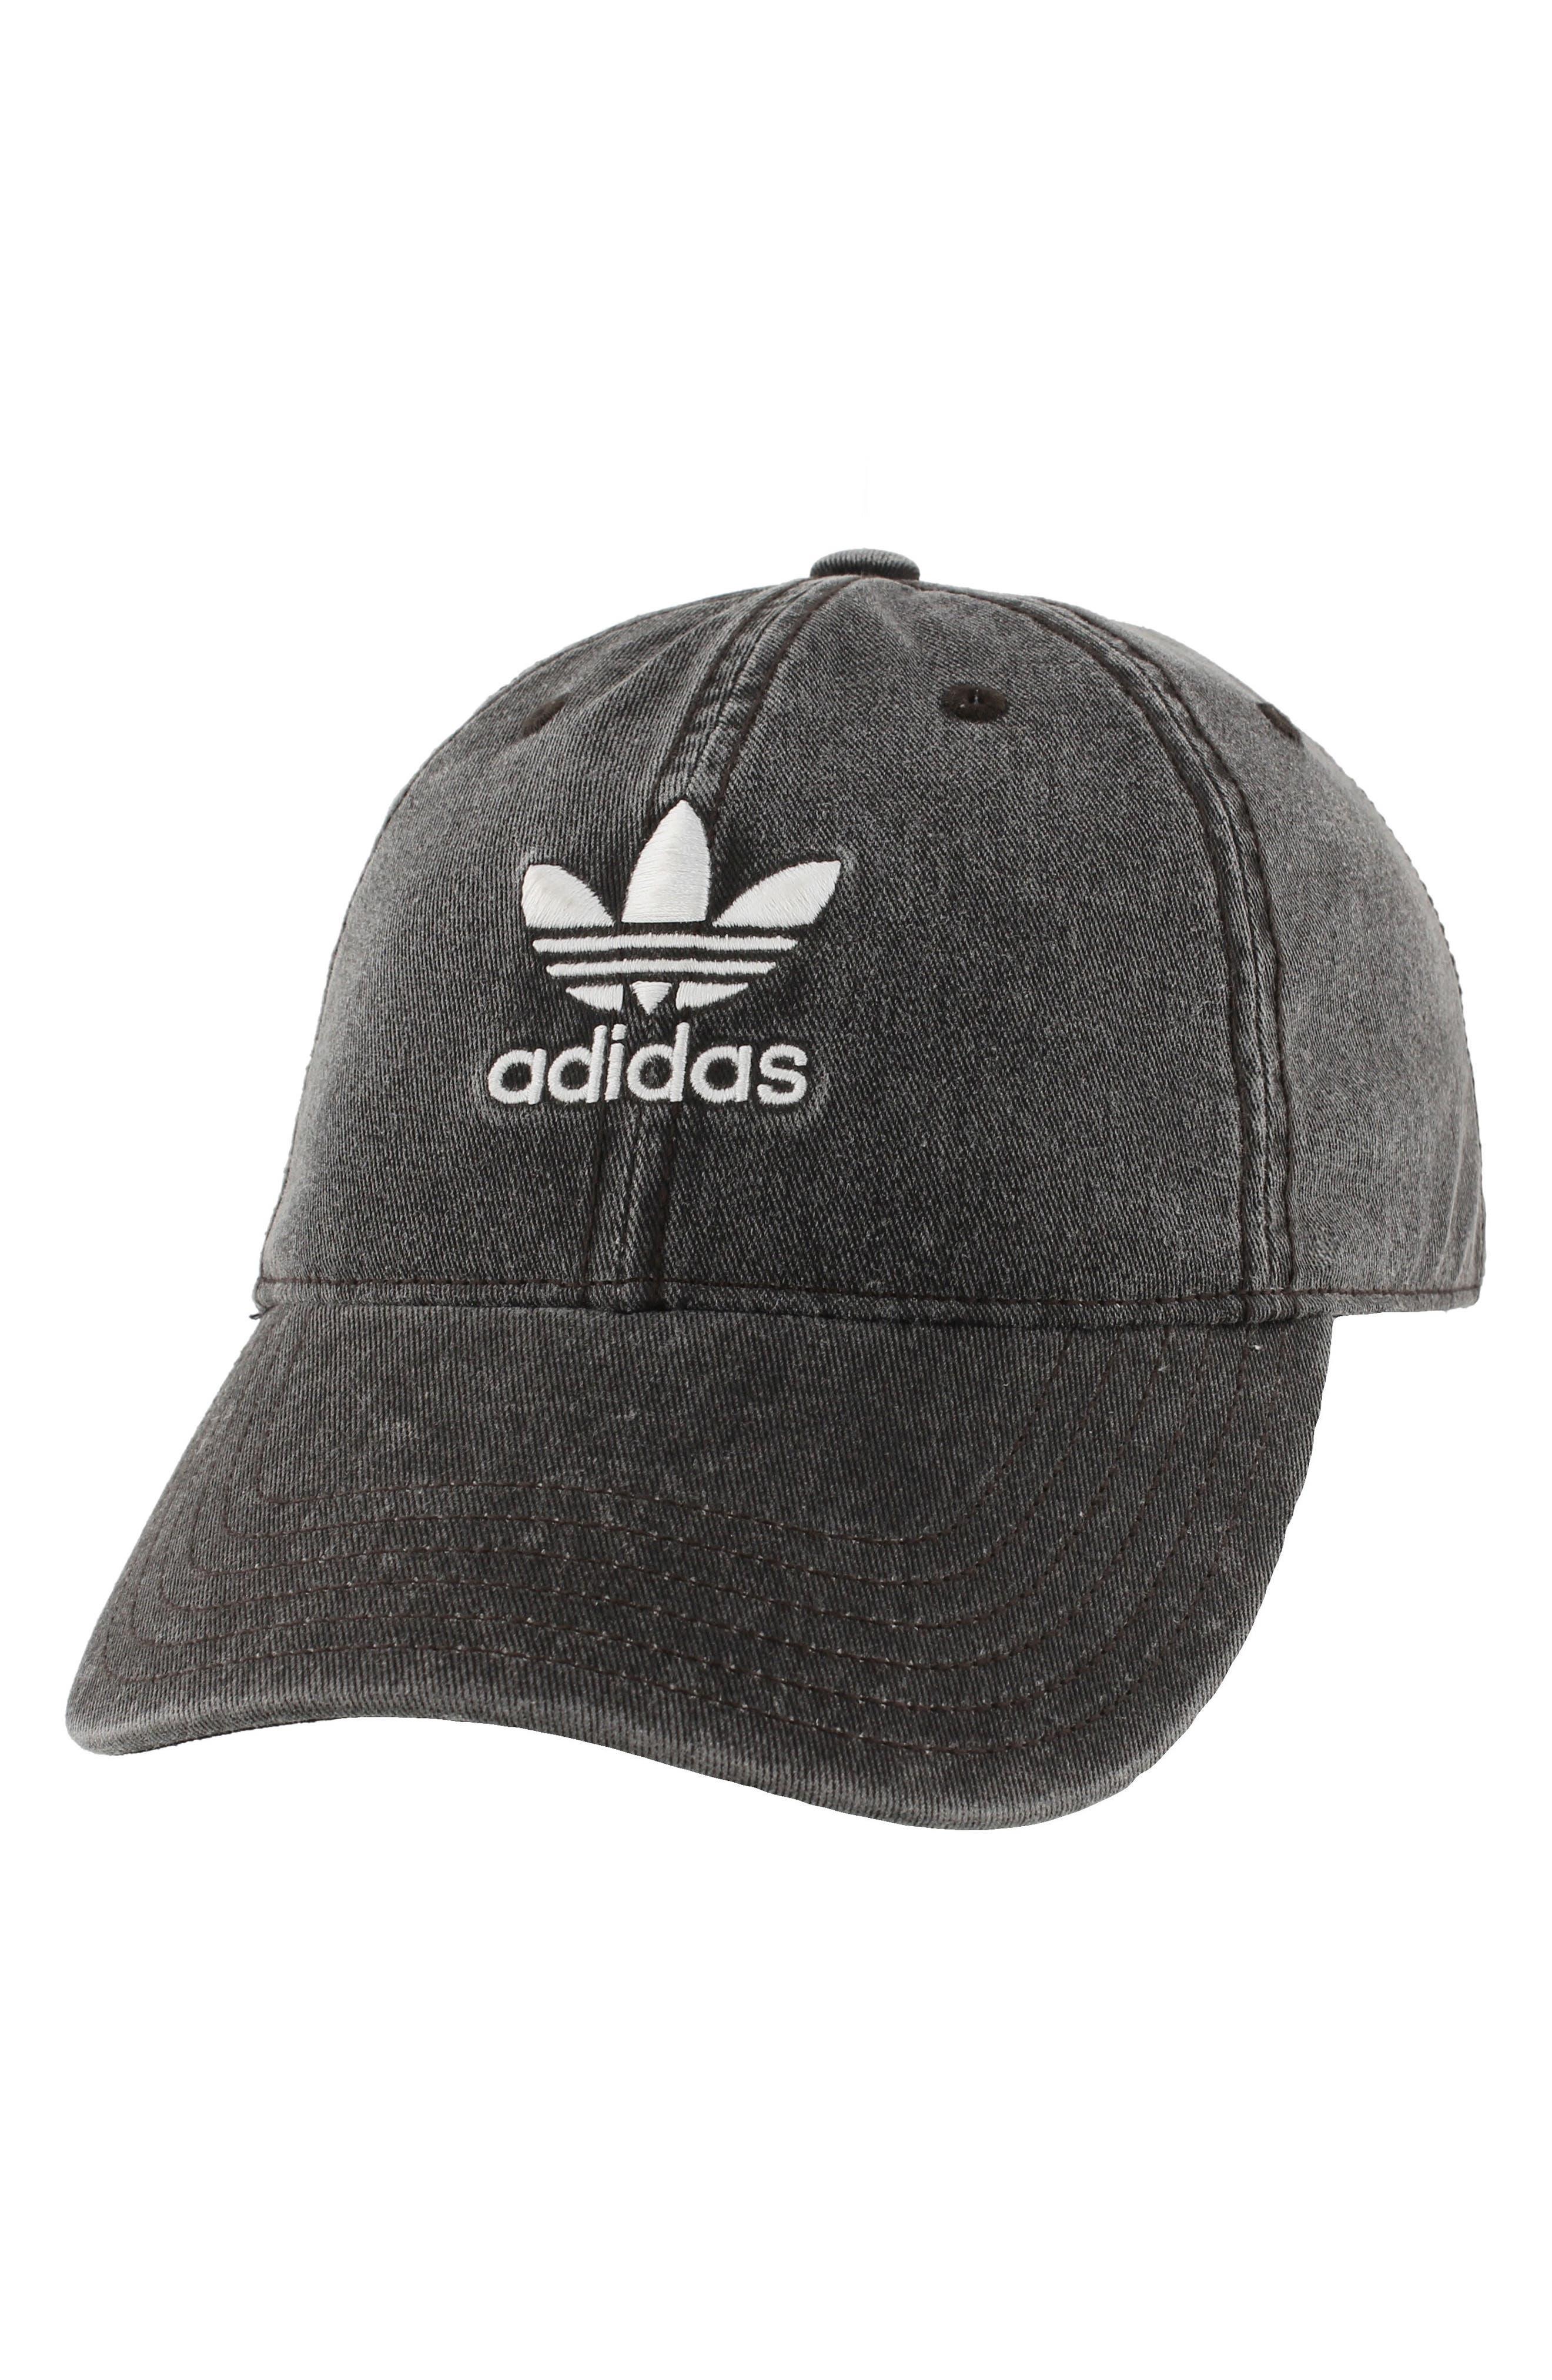 Originals Relaxed Strap-Back Cap,                             Main thumbnail 1, color,                             Black